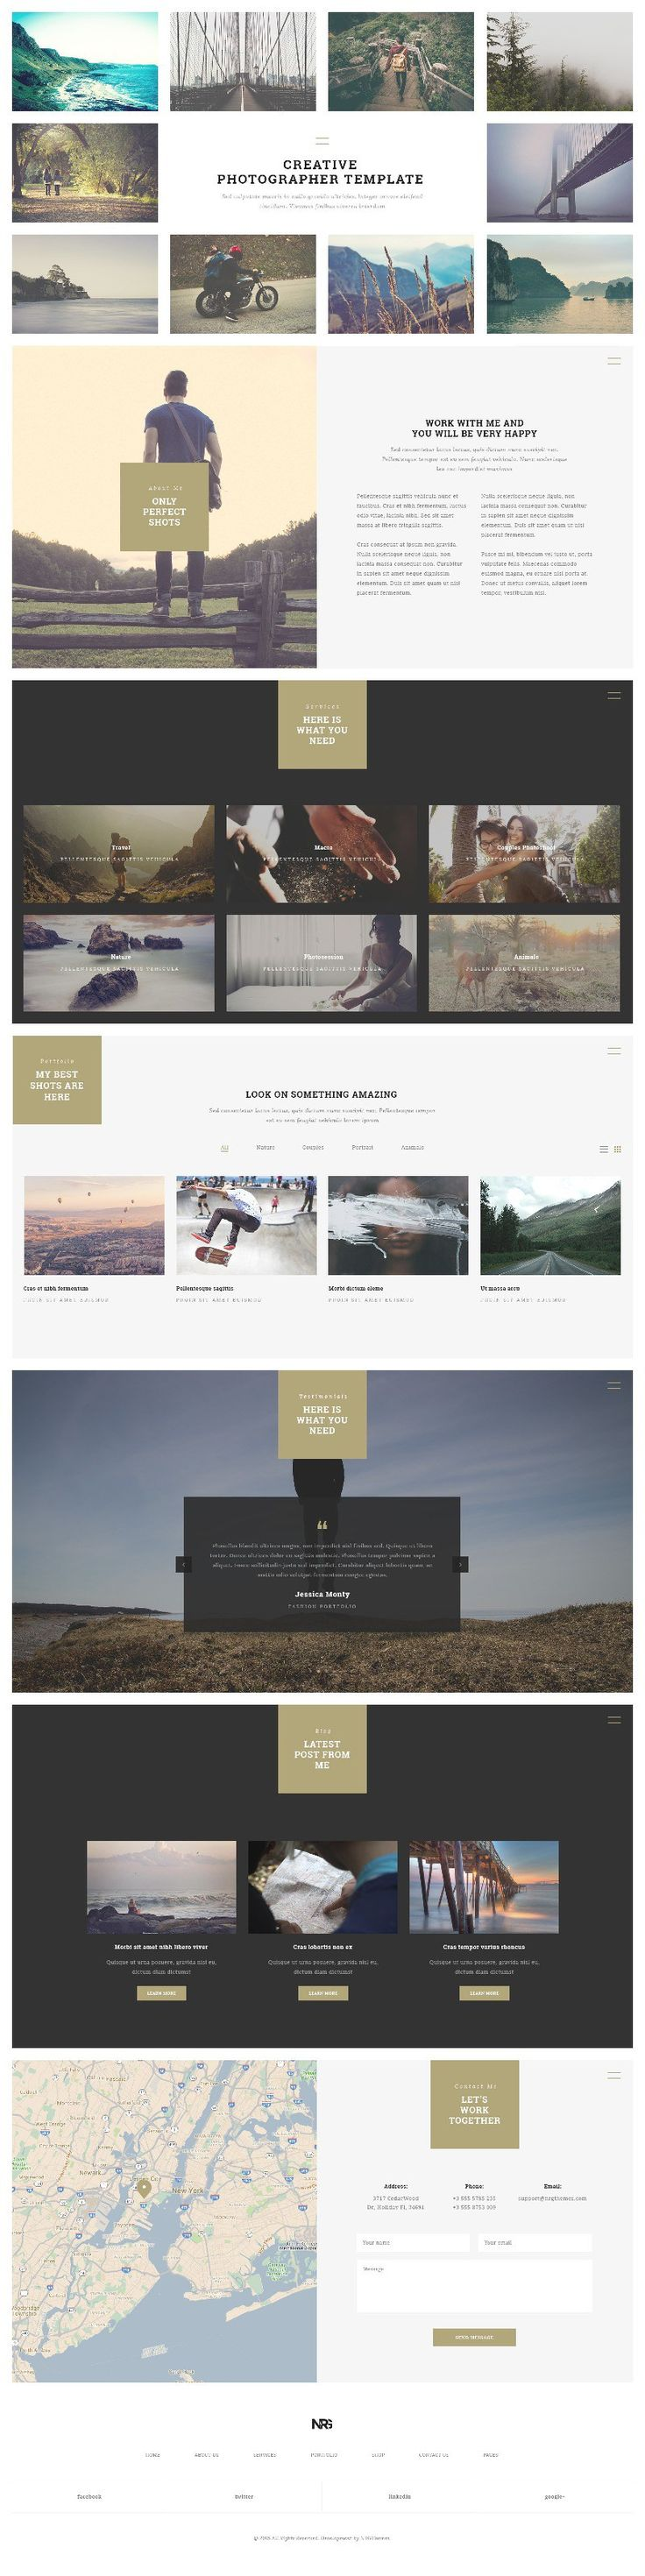 Web Design Inspiration from NRG Part 2